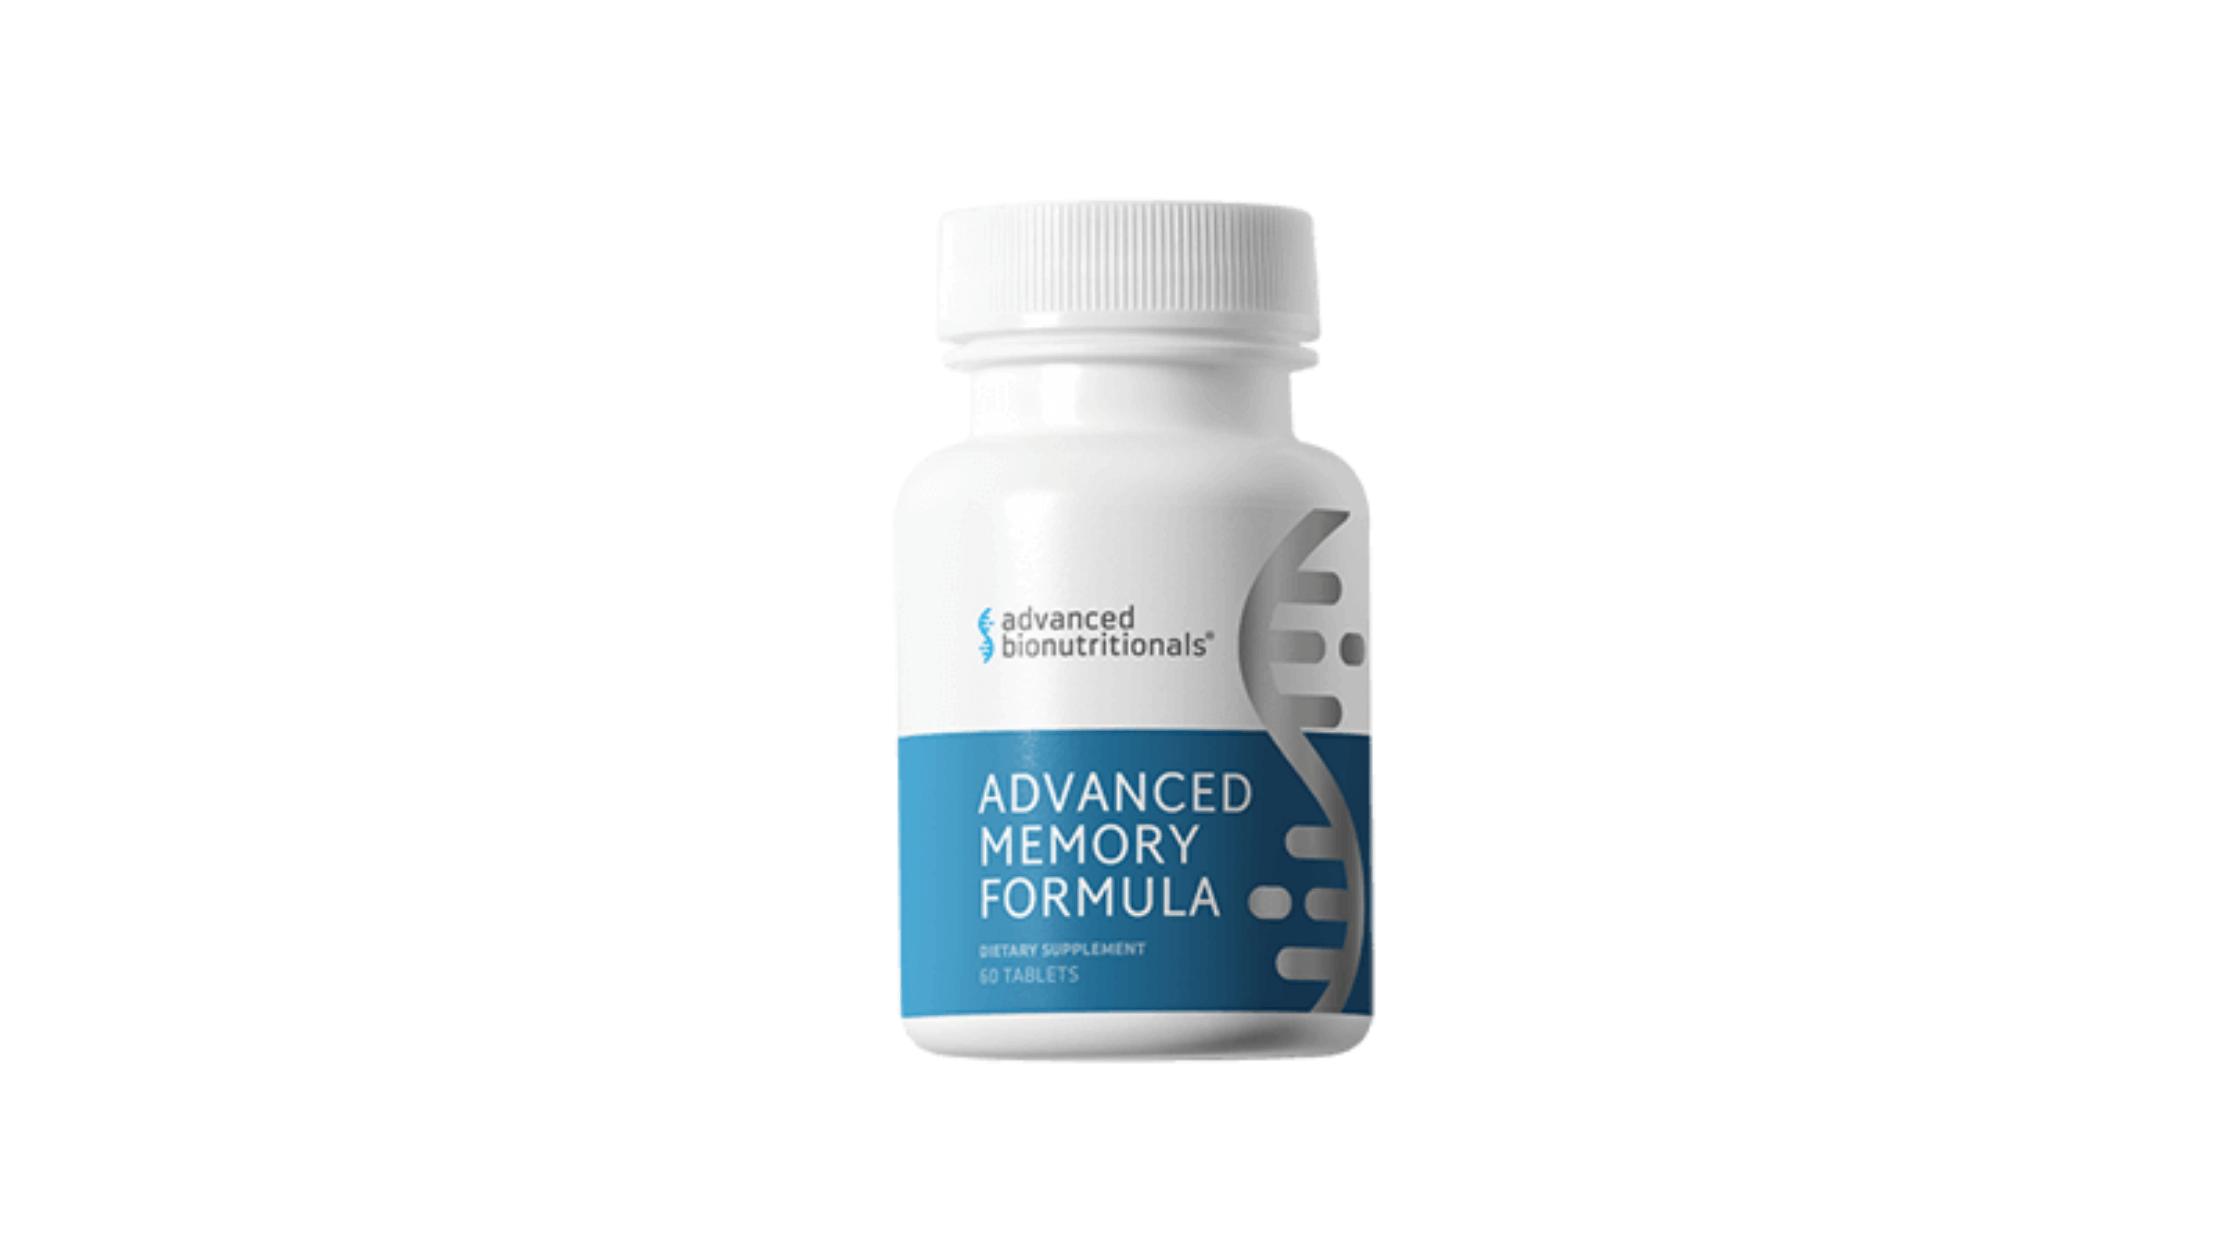 Advanced Memory Formula Reviews